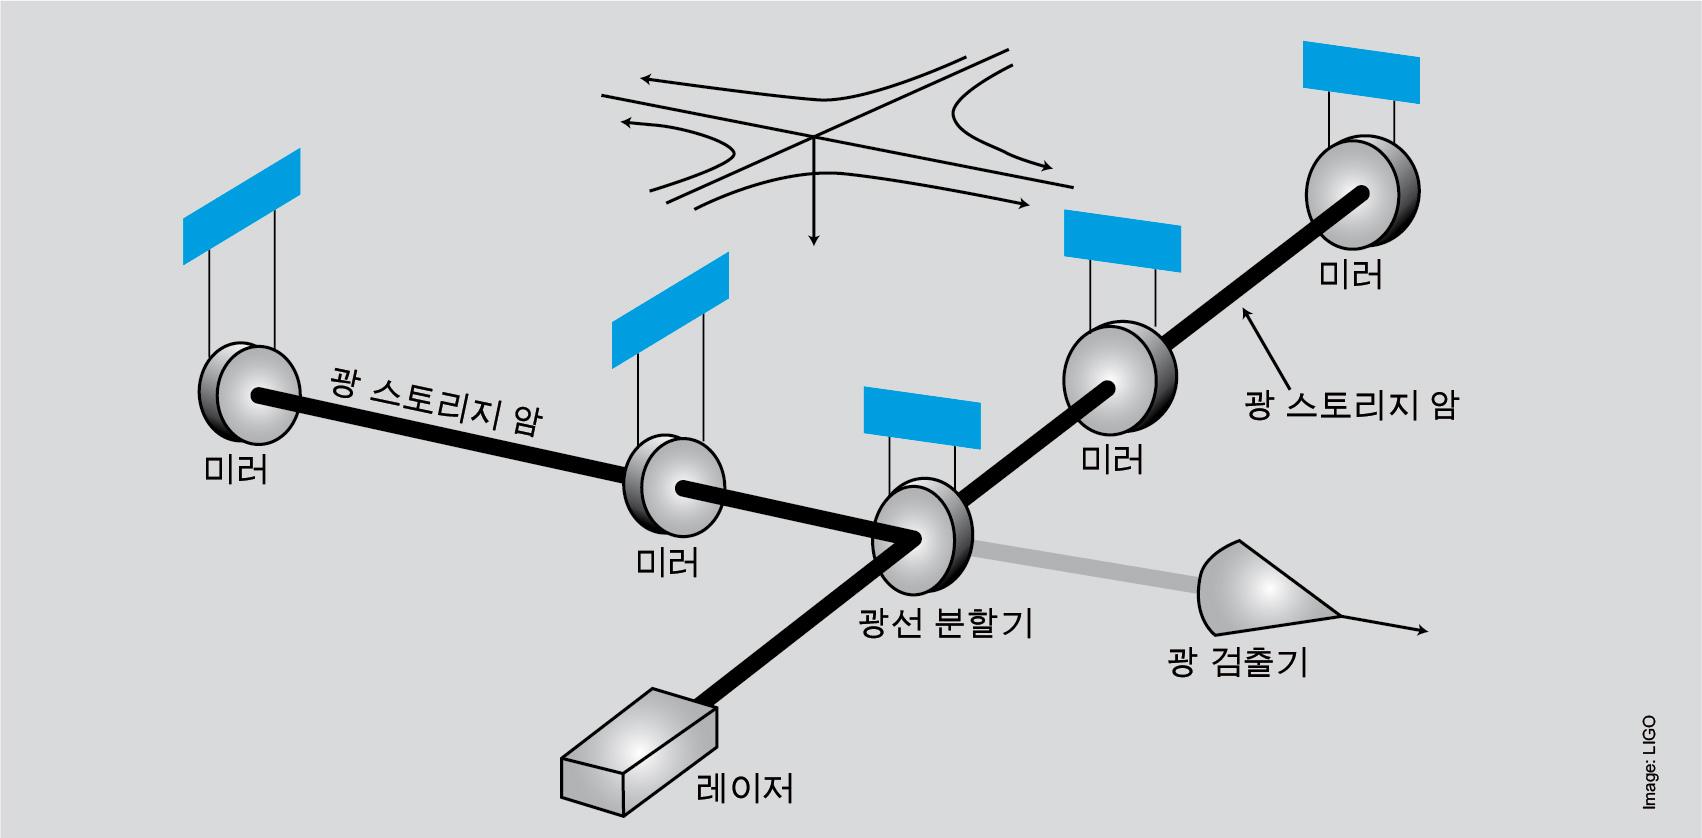 Scheme of the LIGO interferometer for the detection of gravitational waves